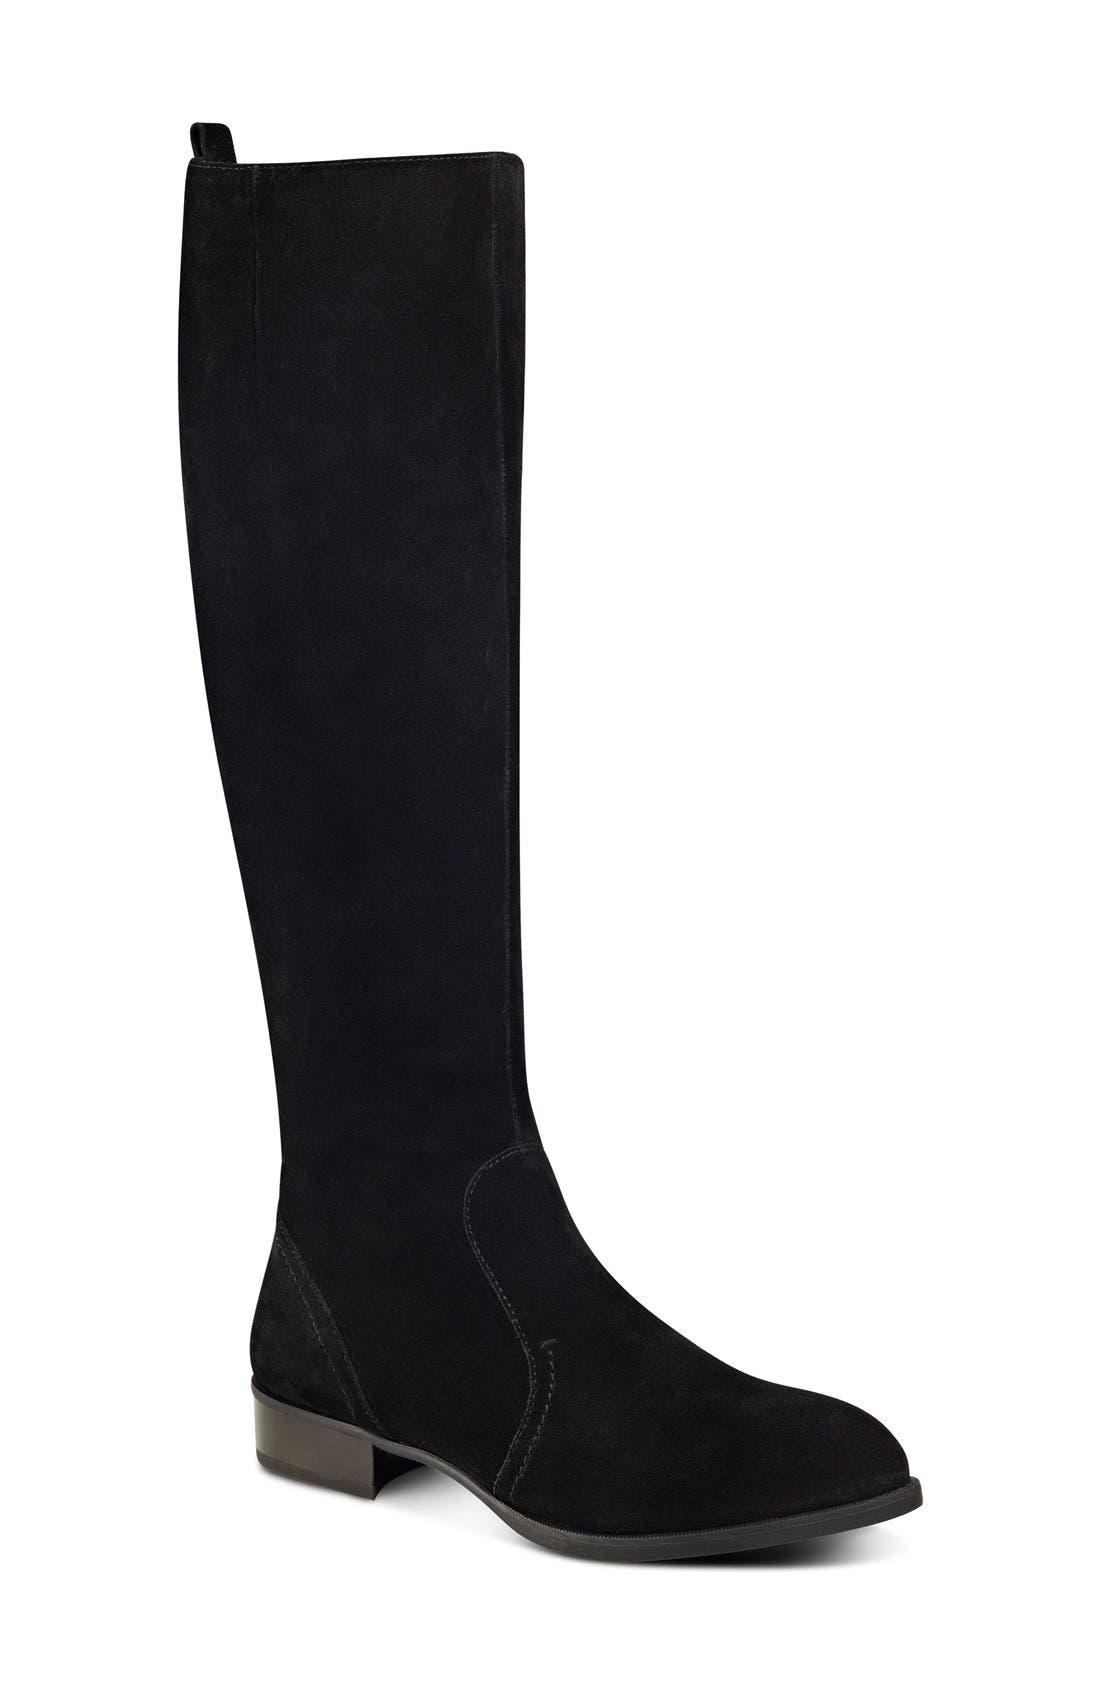 NINE WEST 'Nicolah' Tall Boot, Main, color, 001